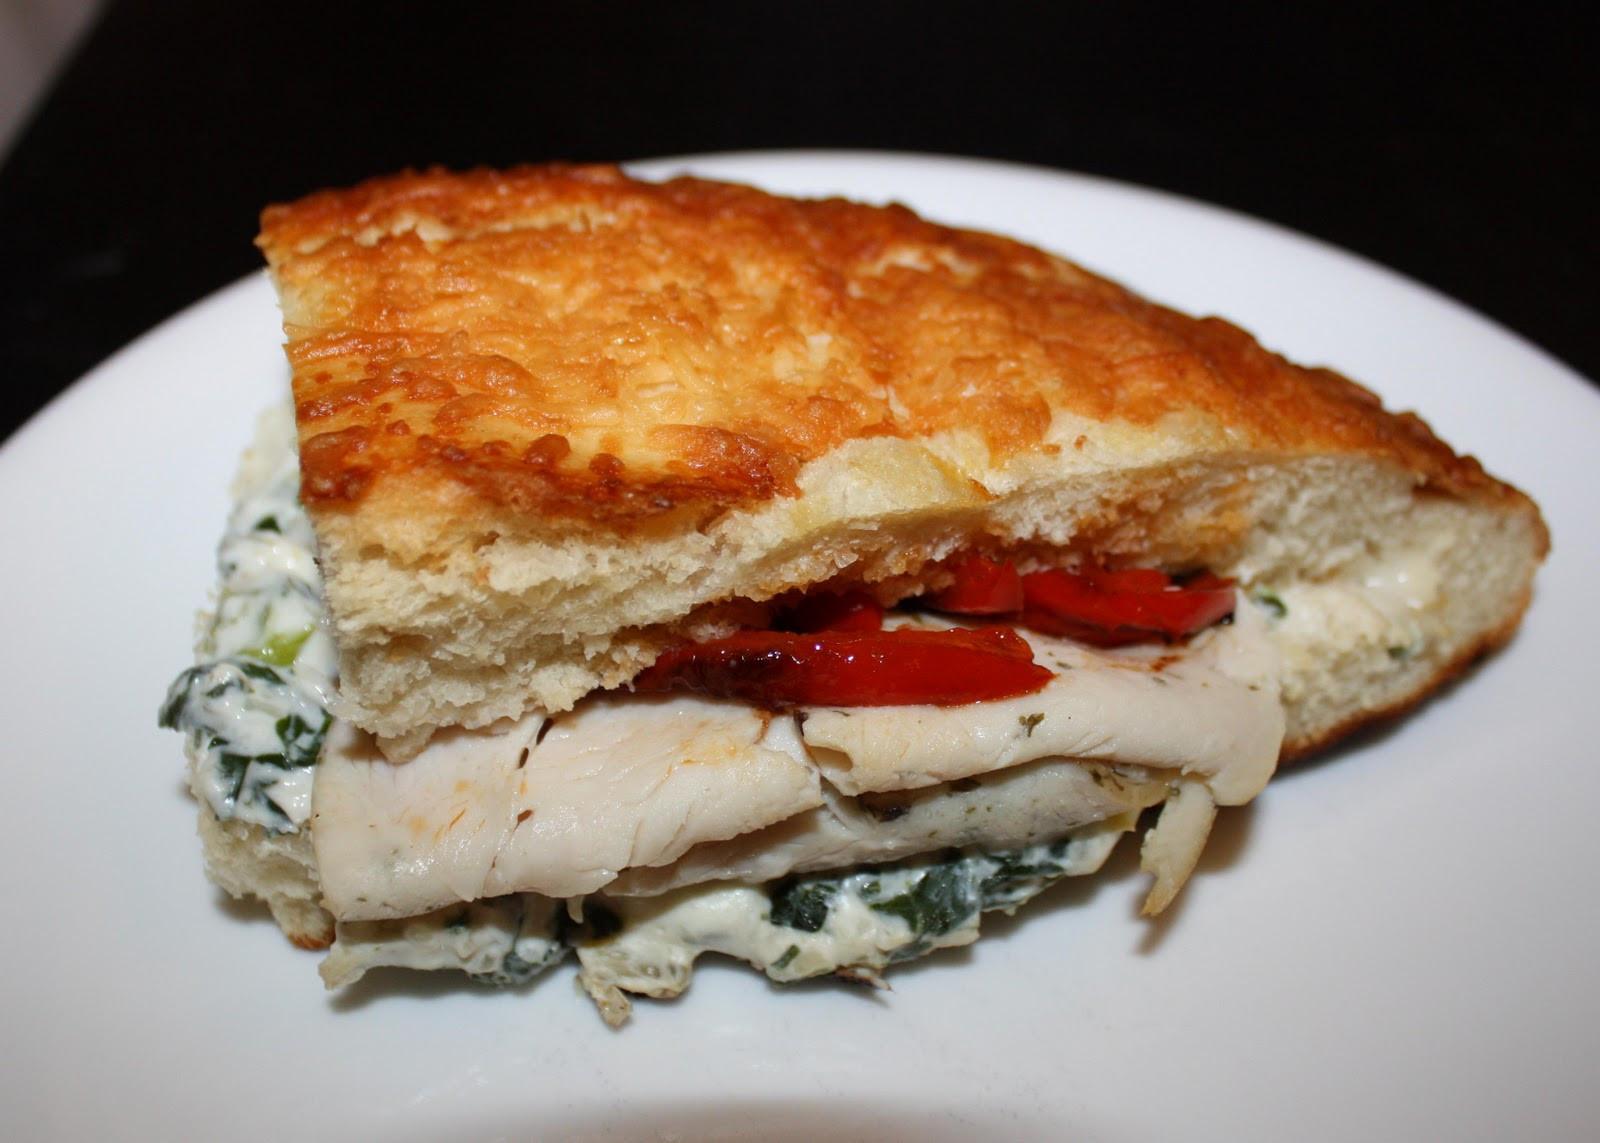 Panera Bread Thanksgiving  Olive The Ingre nts Panera Bread s Turkey Artichoke Panini